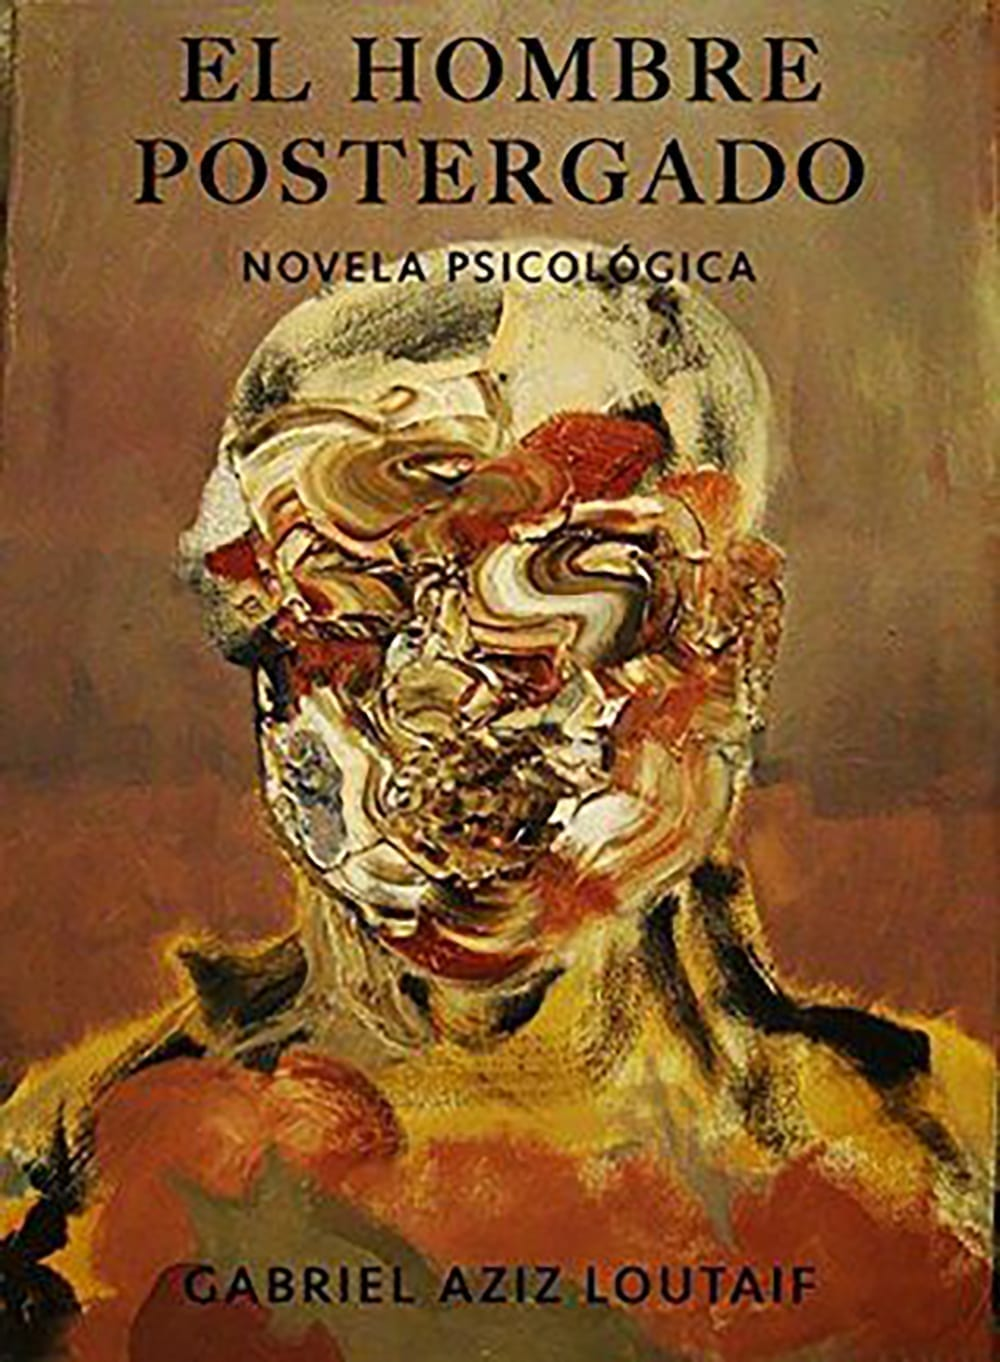 'El hombre postergado' de Gabriel Aziz Loutaif